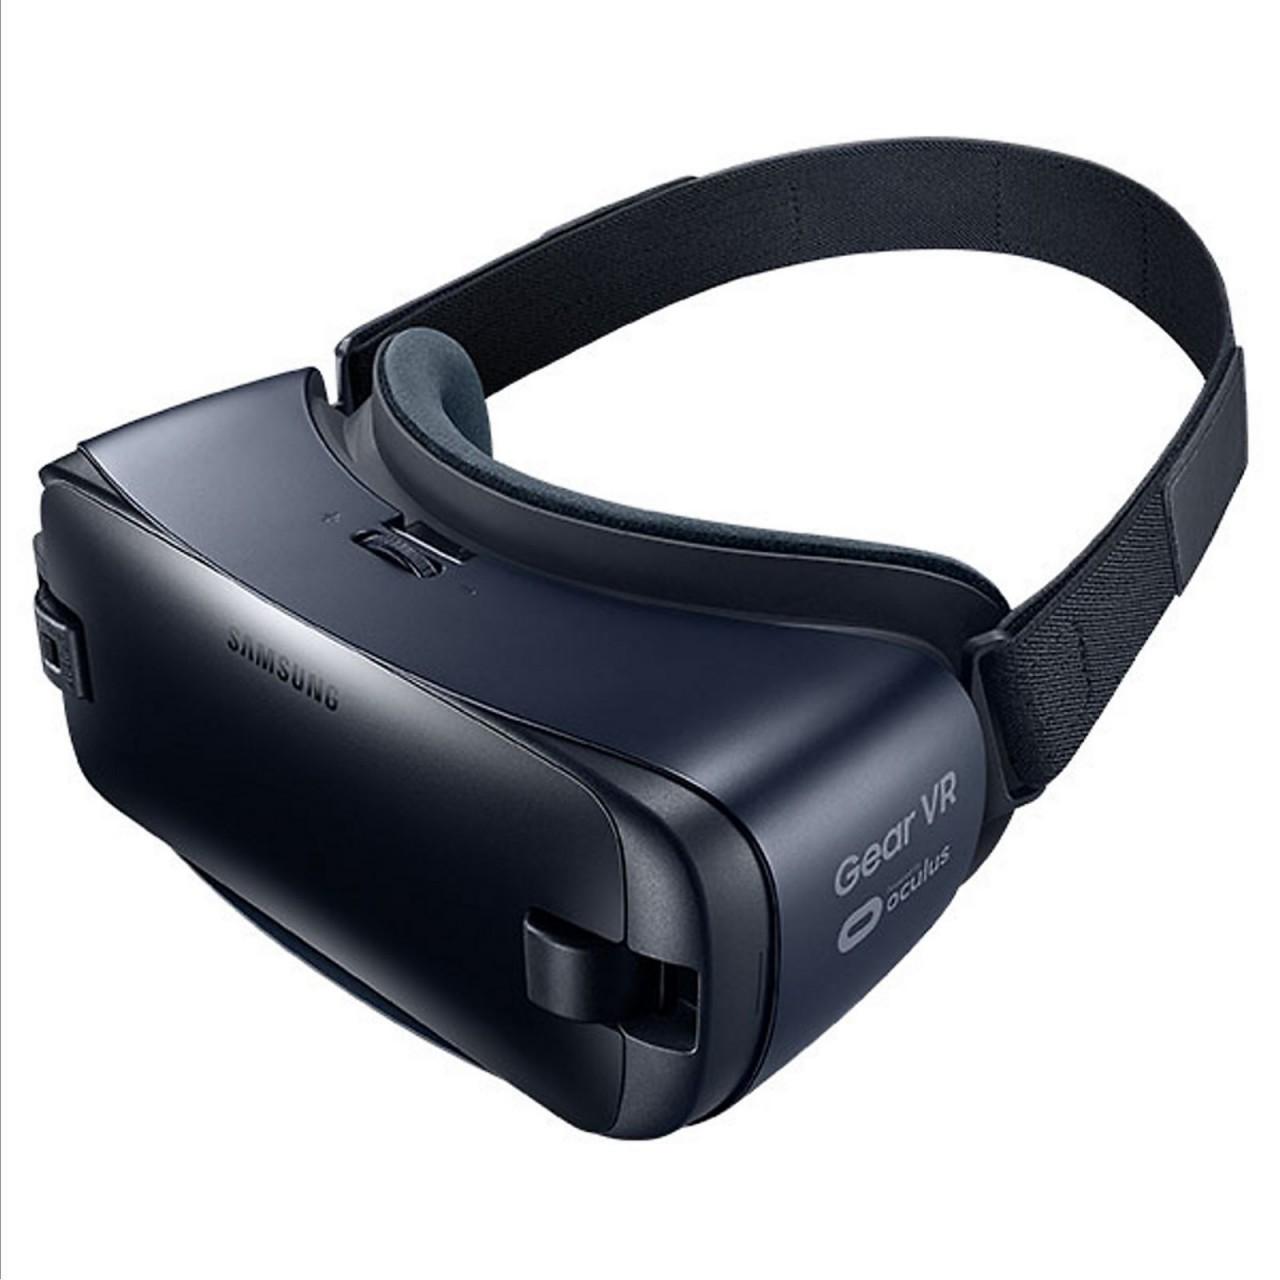 c31b5d73d60 Genuine Samsung Gear VR Oculus 2016 SM-R323 for Galaxy Note 7 5 S7 S6 edge  Black